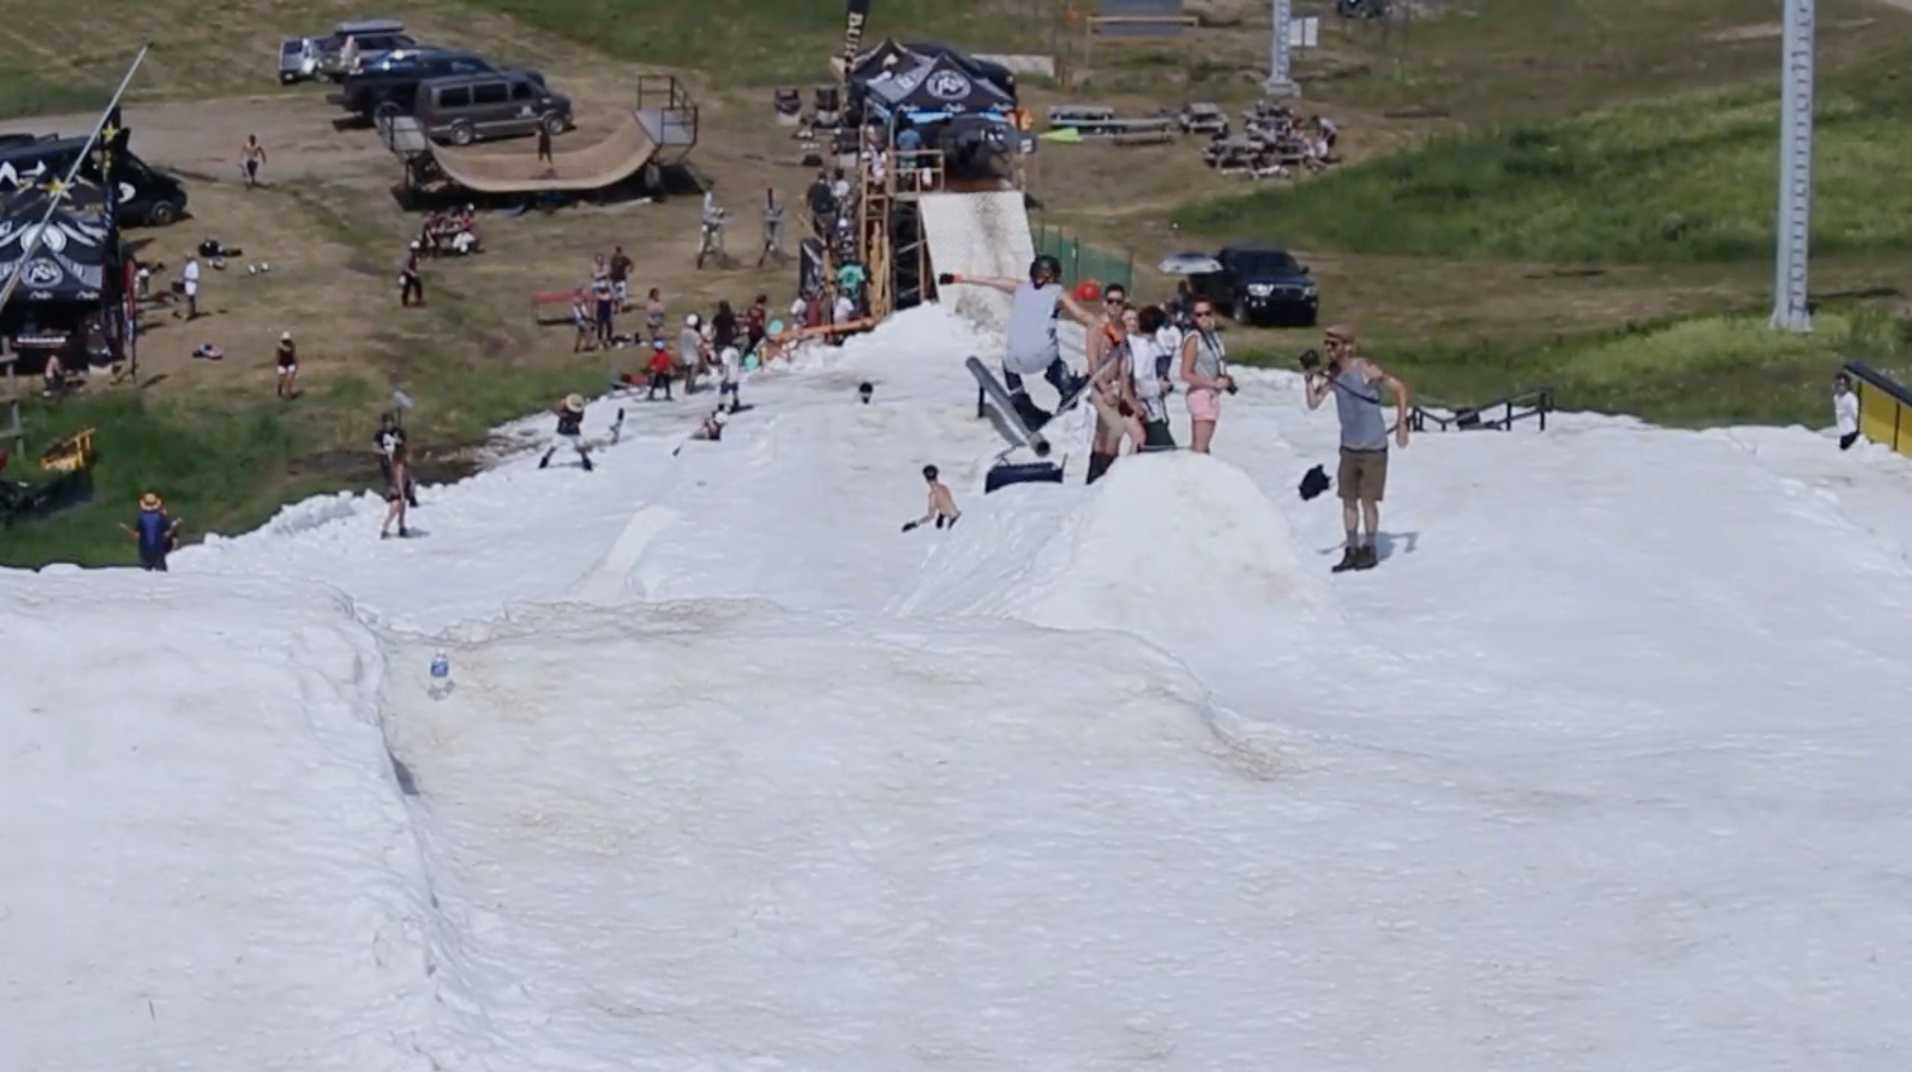 summer snowboarding quebec - BOARD RAP